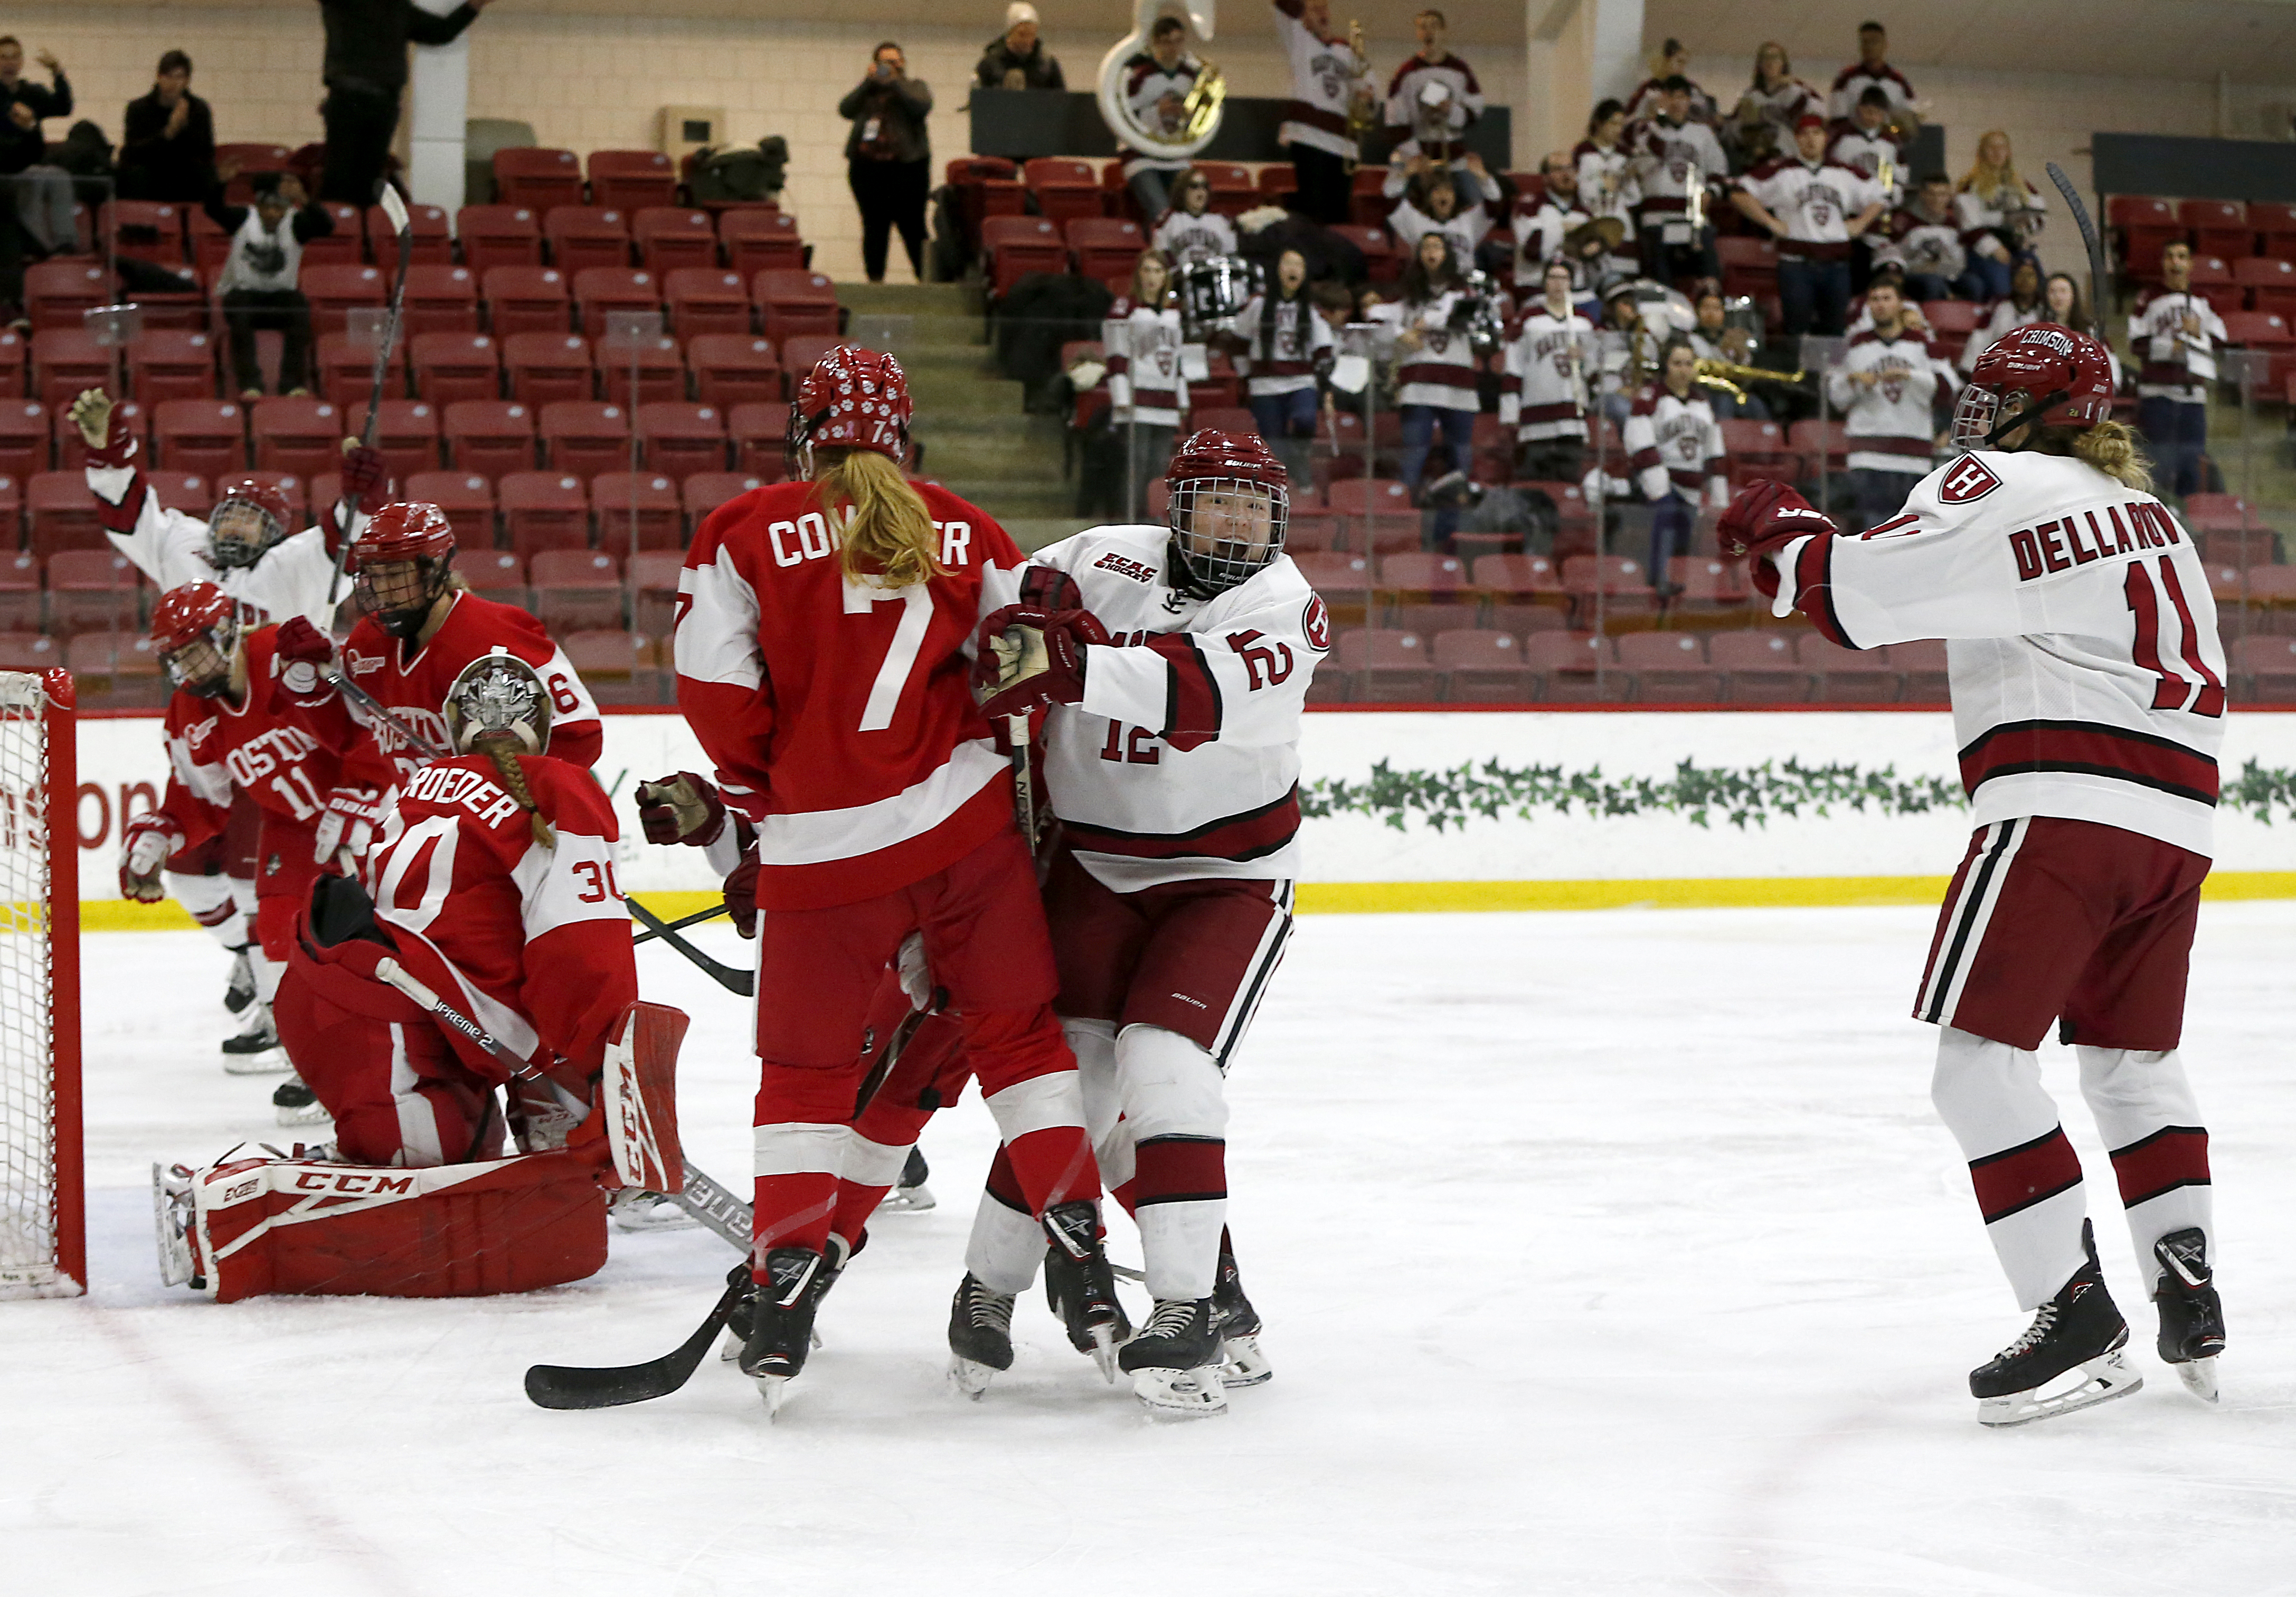 Women's Beanpot Championship Game: Boston University Vs Harvard University At Bright-Landry Hockey Center